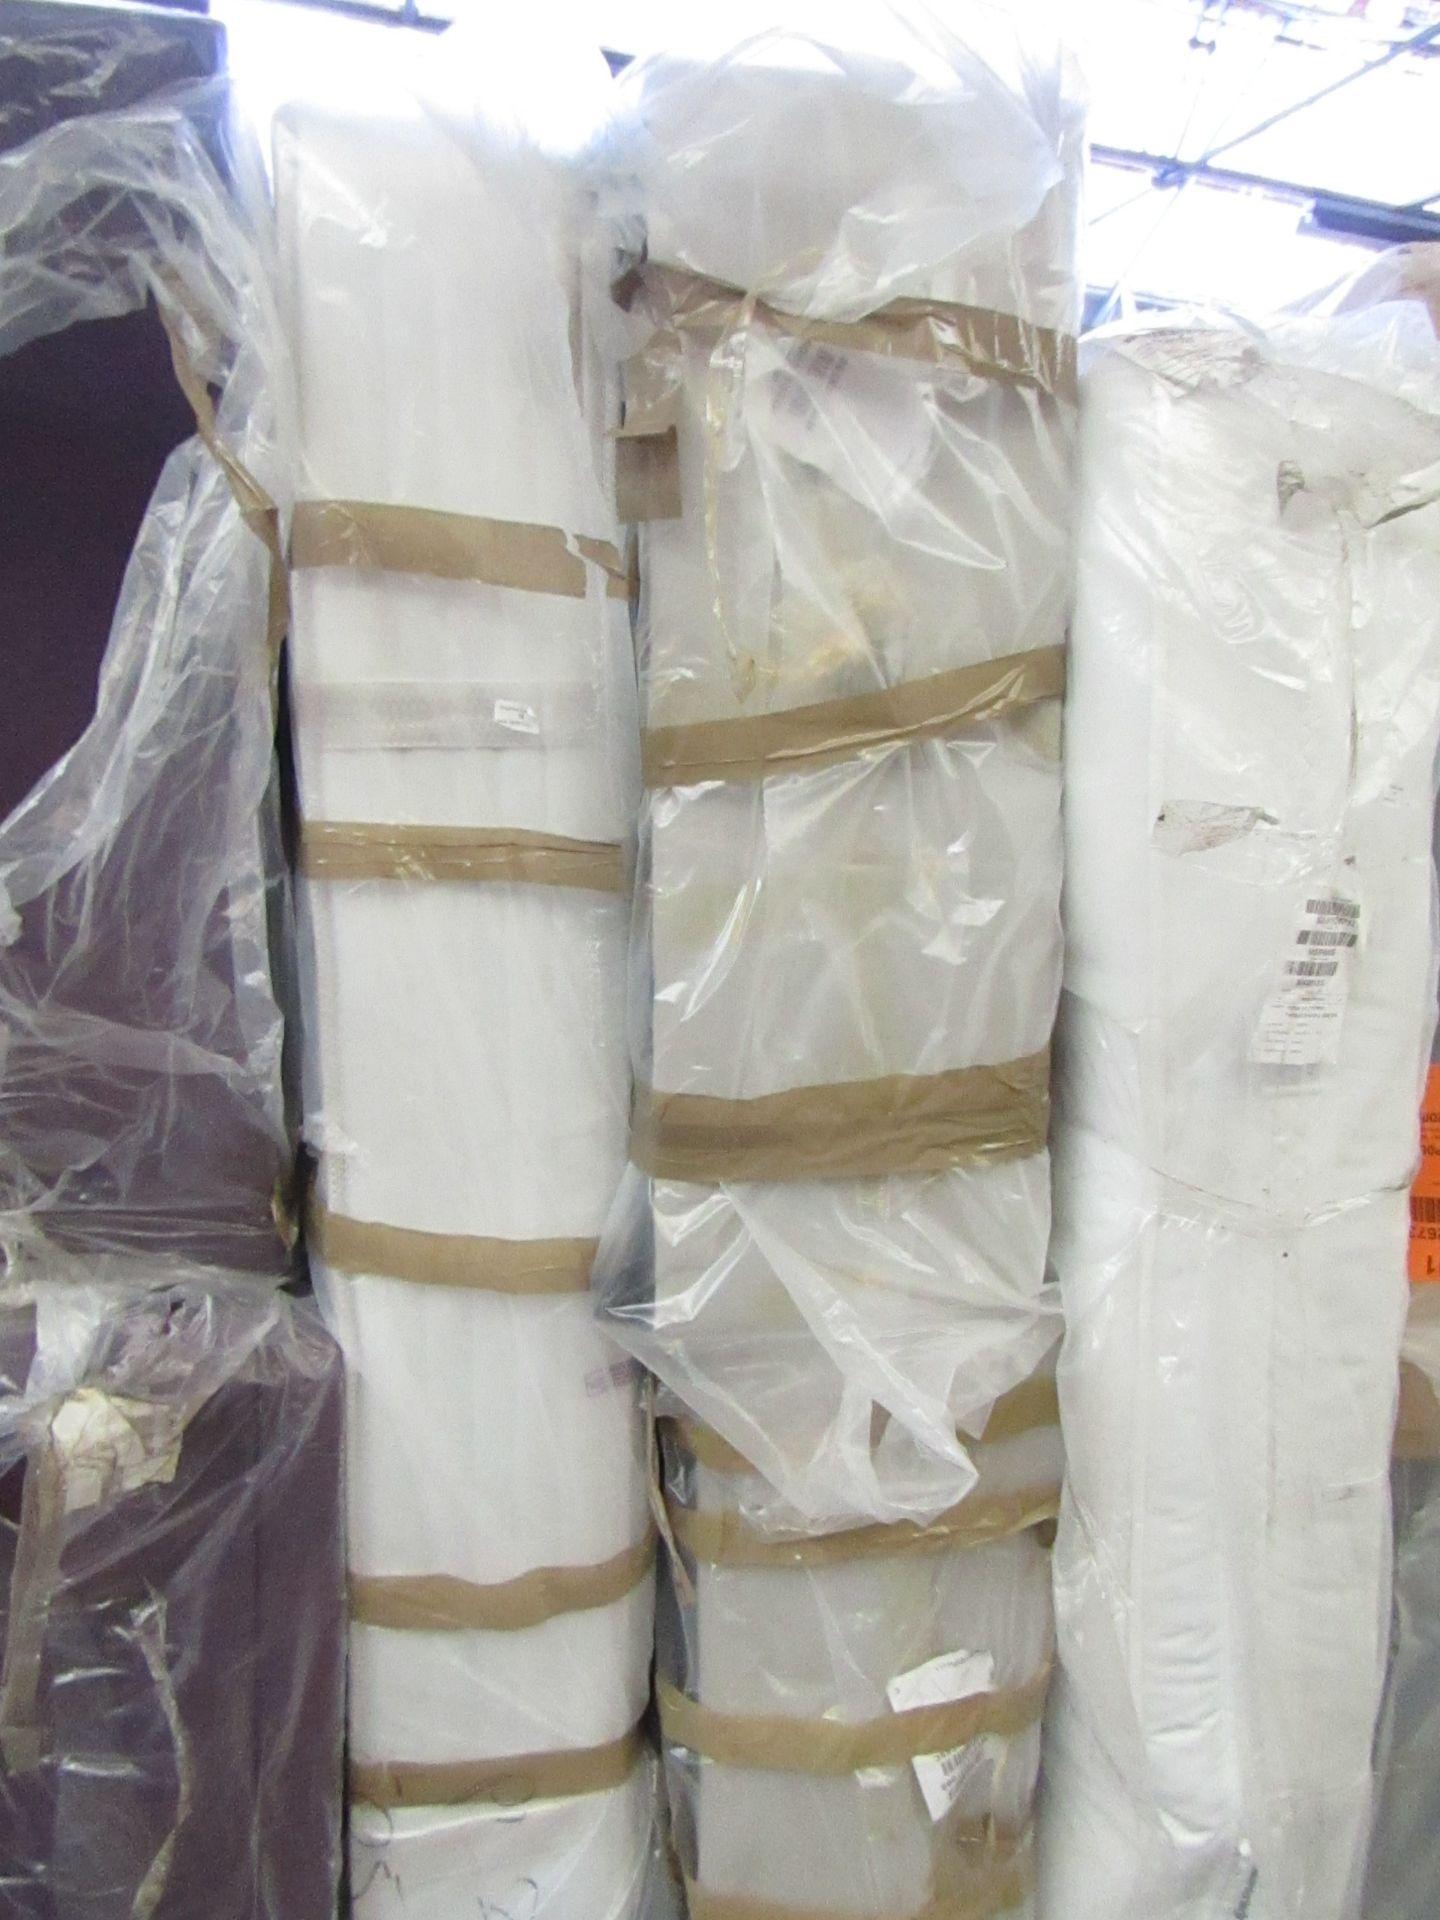 Lot 10 - Sealey Response Orthopedic Comfort King Size Mattress with 2 drawer divan Base, RRP £1799.98